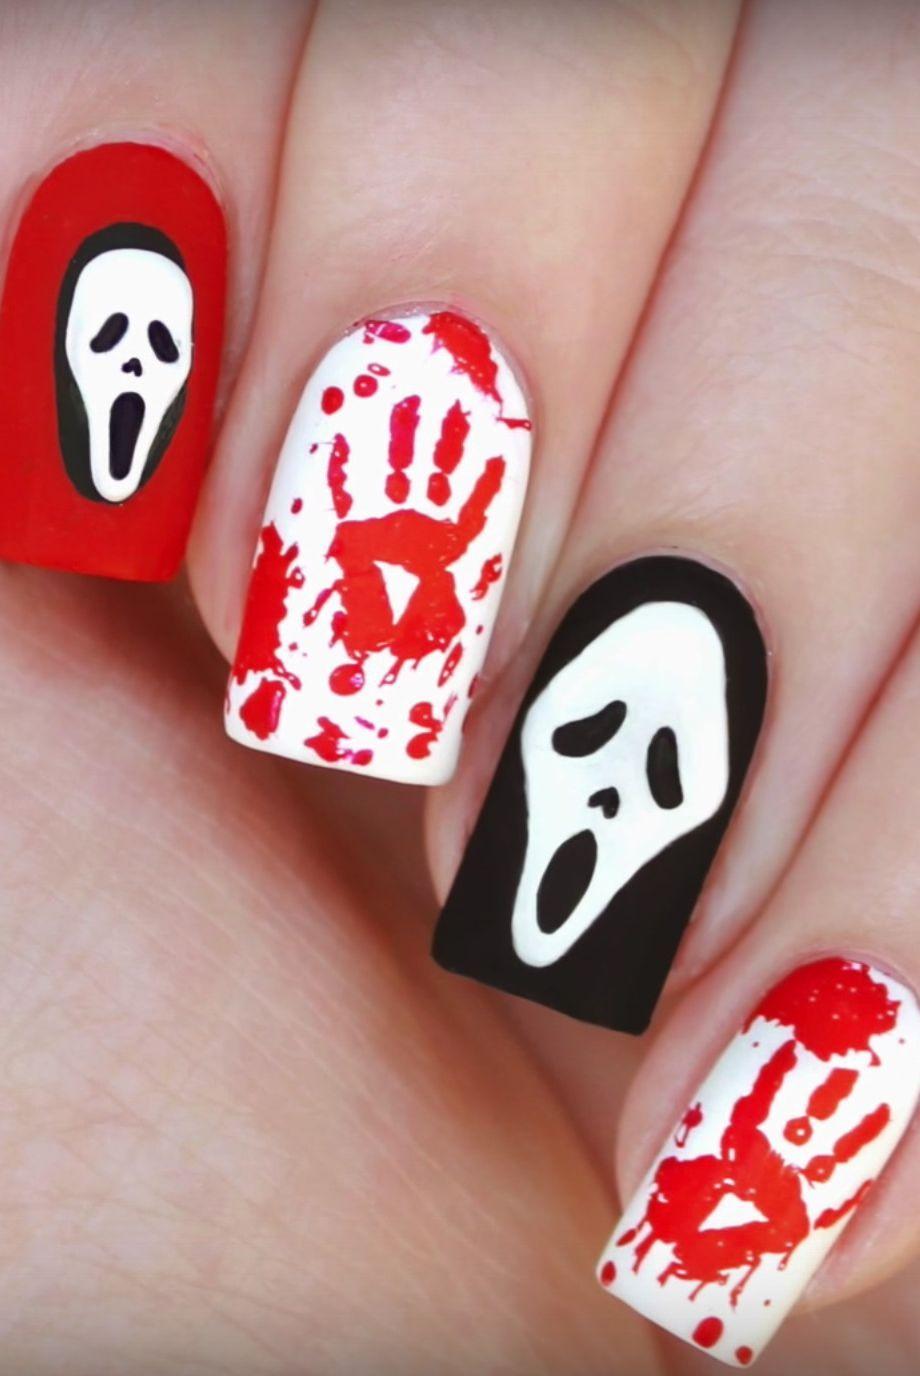 48 Fun Creepy And Kooky Nail Art Ideas For The Halloween Obsessed Halloween Nail Polish Designs Halloween Nail Art Halloween Nail Designs